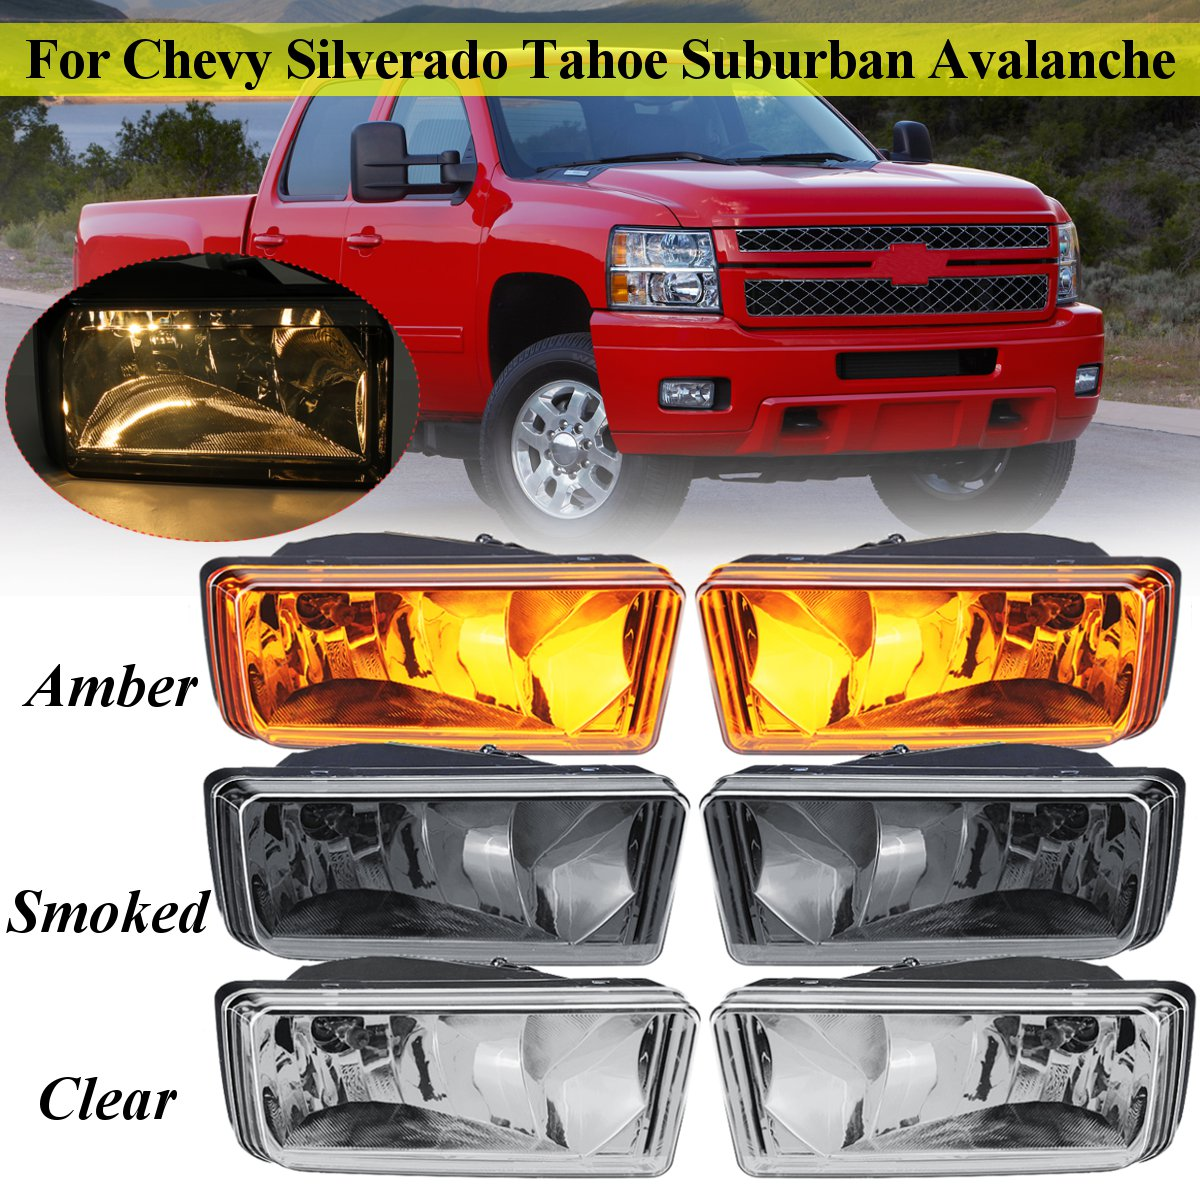 FOR CADILLAC SRX 2004 2005 2006 2007 2008 2009 2009 FOG LAMP W//SIGNAL LEFT